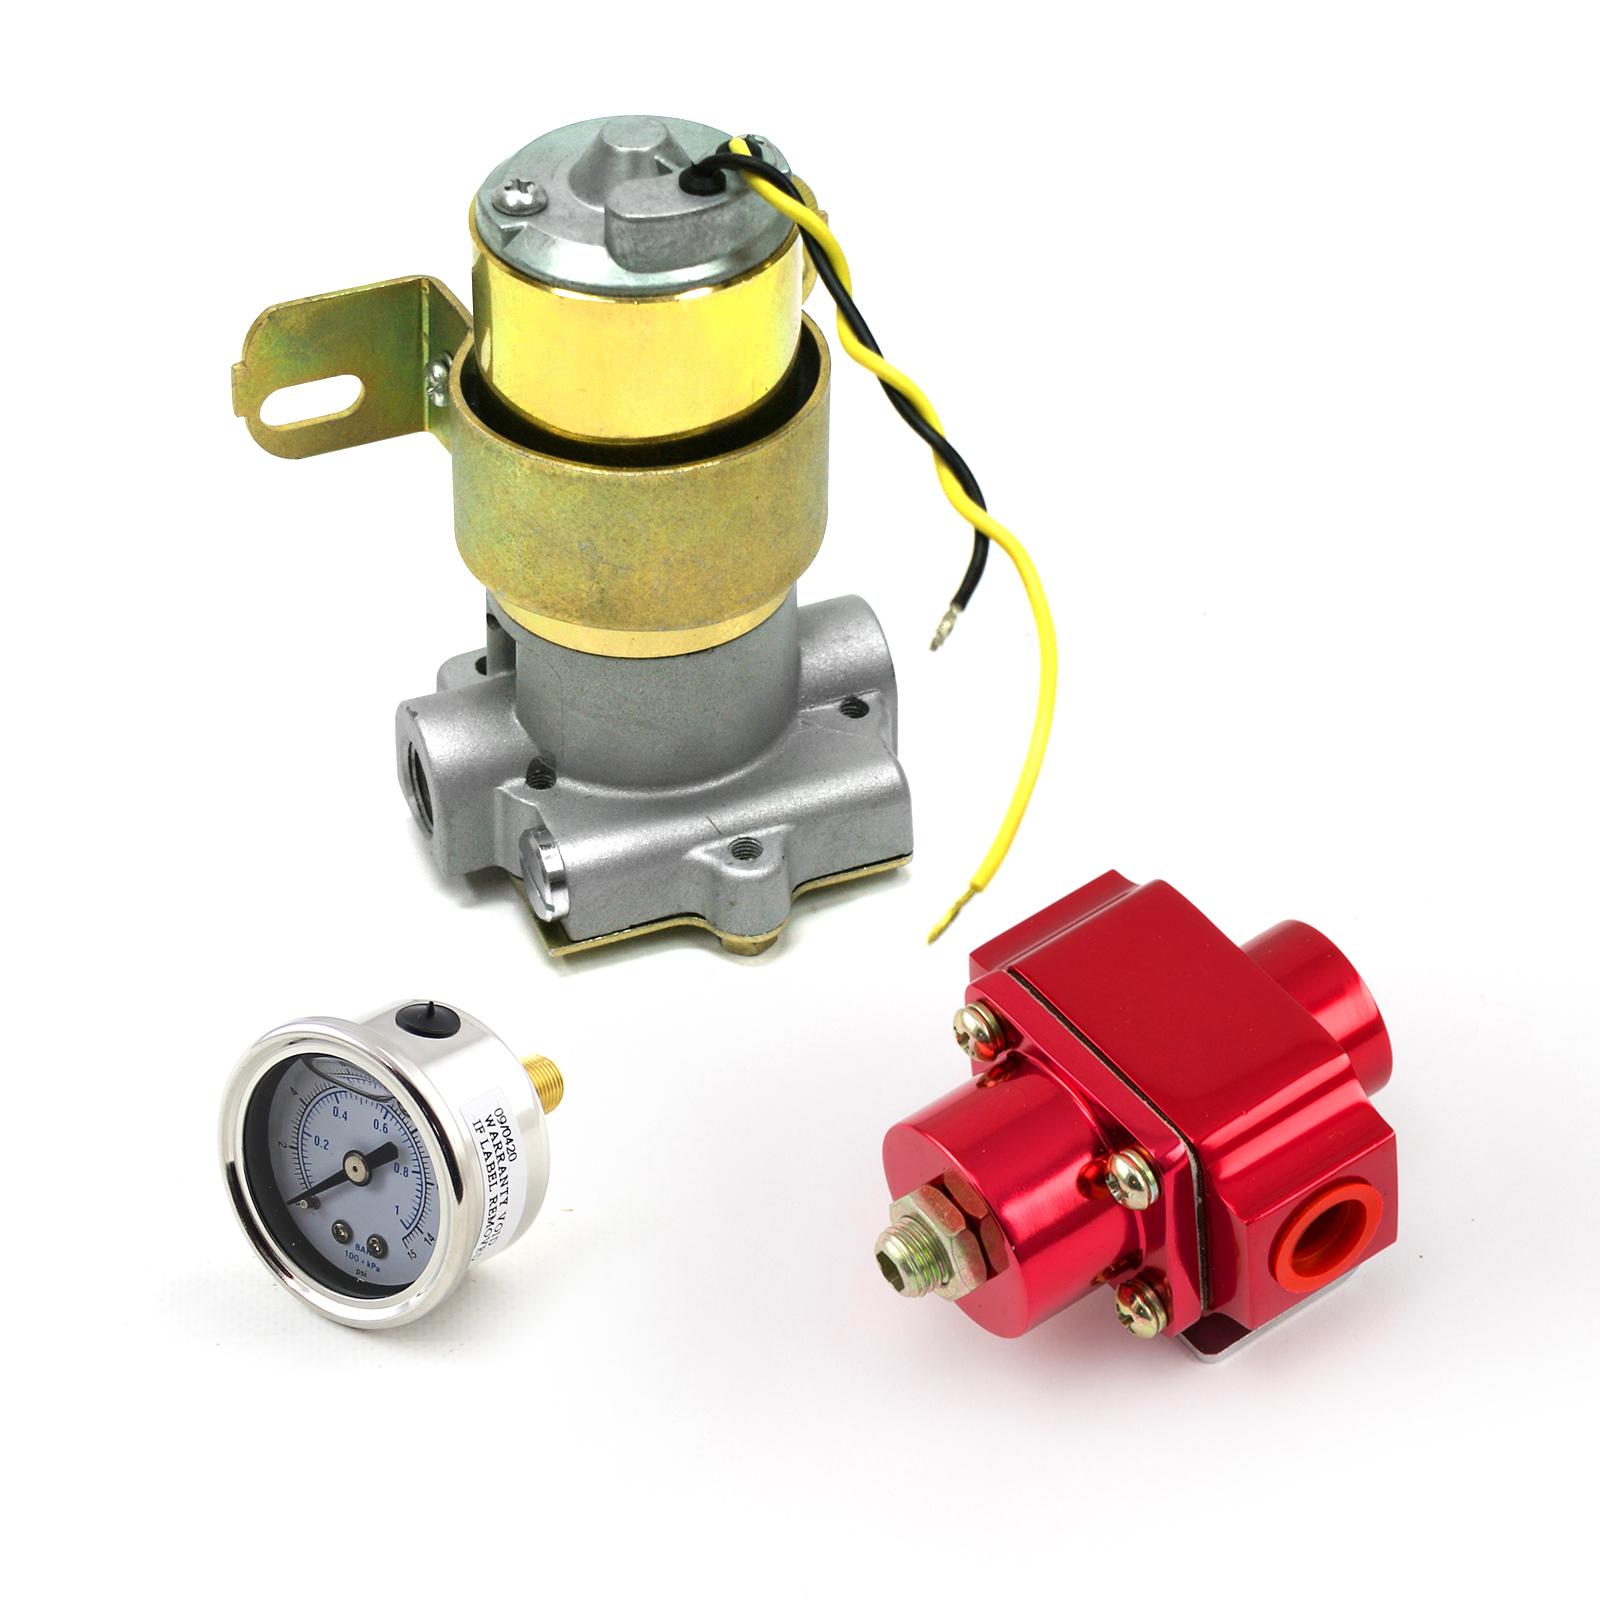 95 Gph Universal Electric Fuel Pump Red Regulator & Gauge Combo Kit